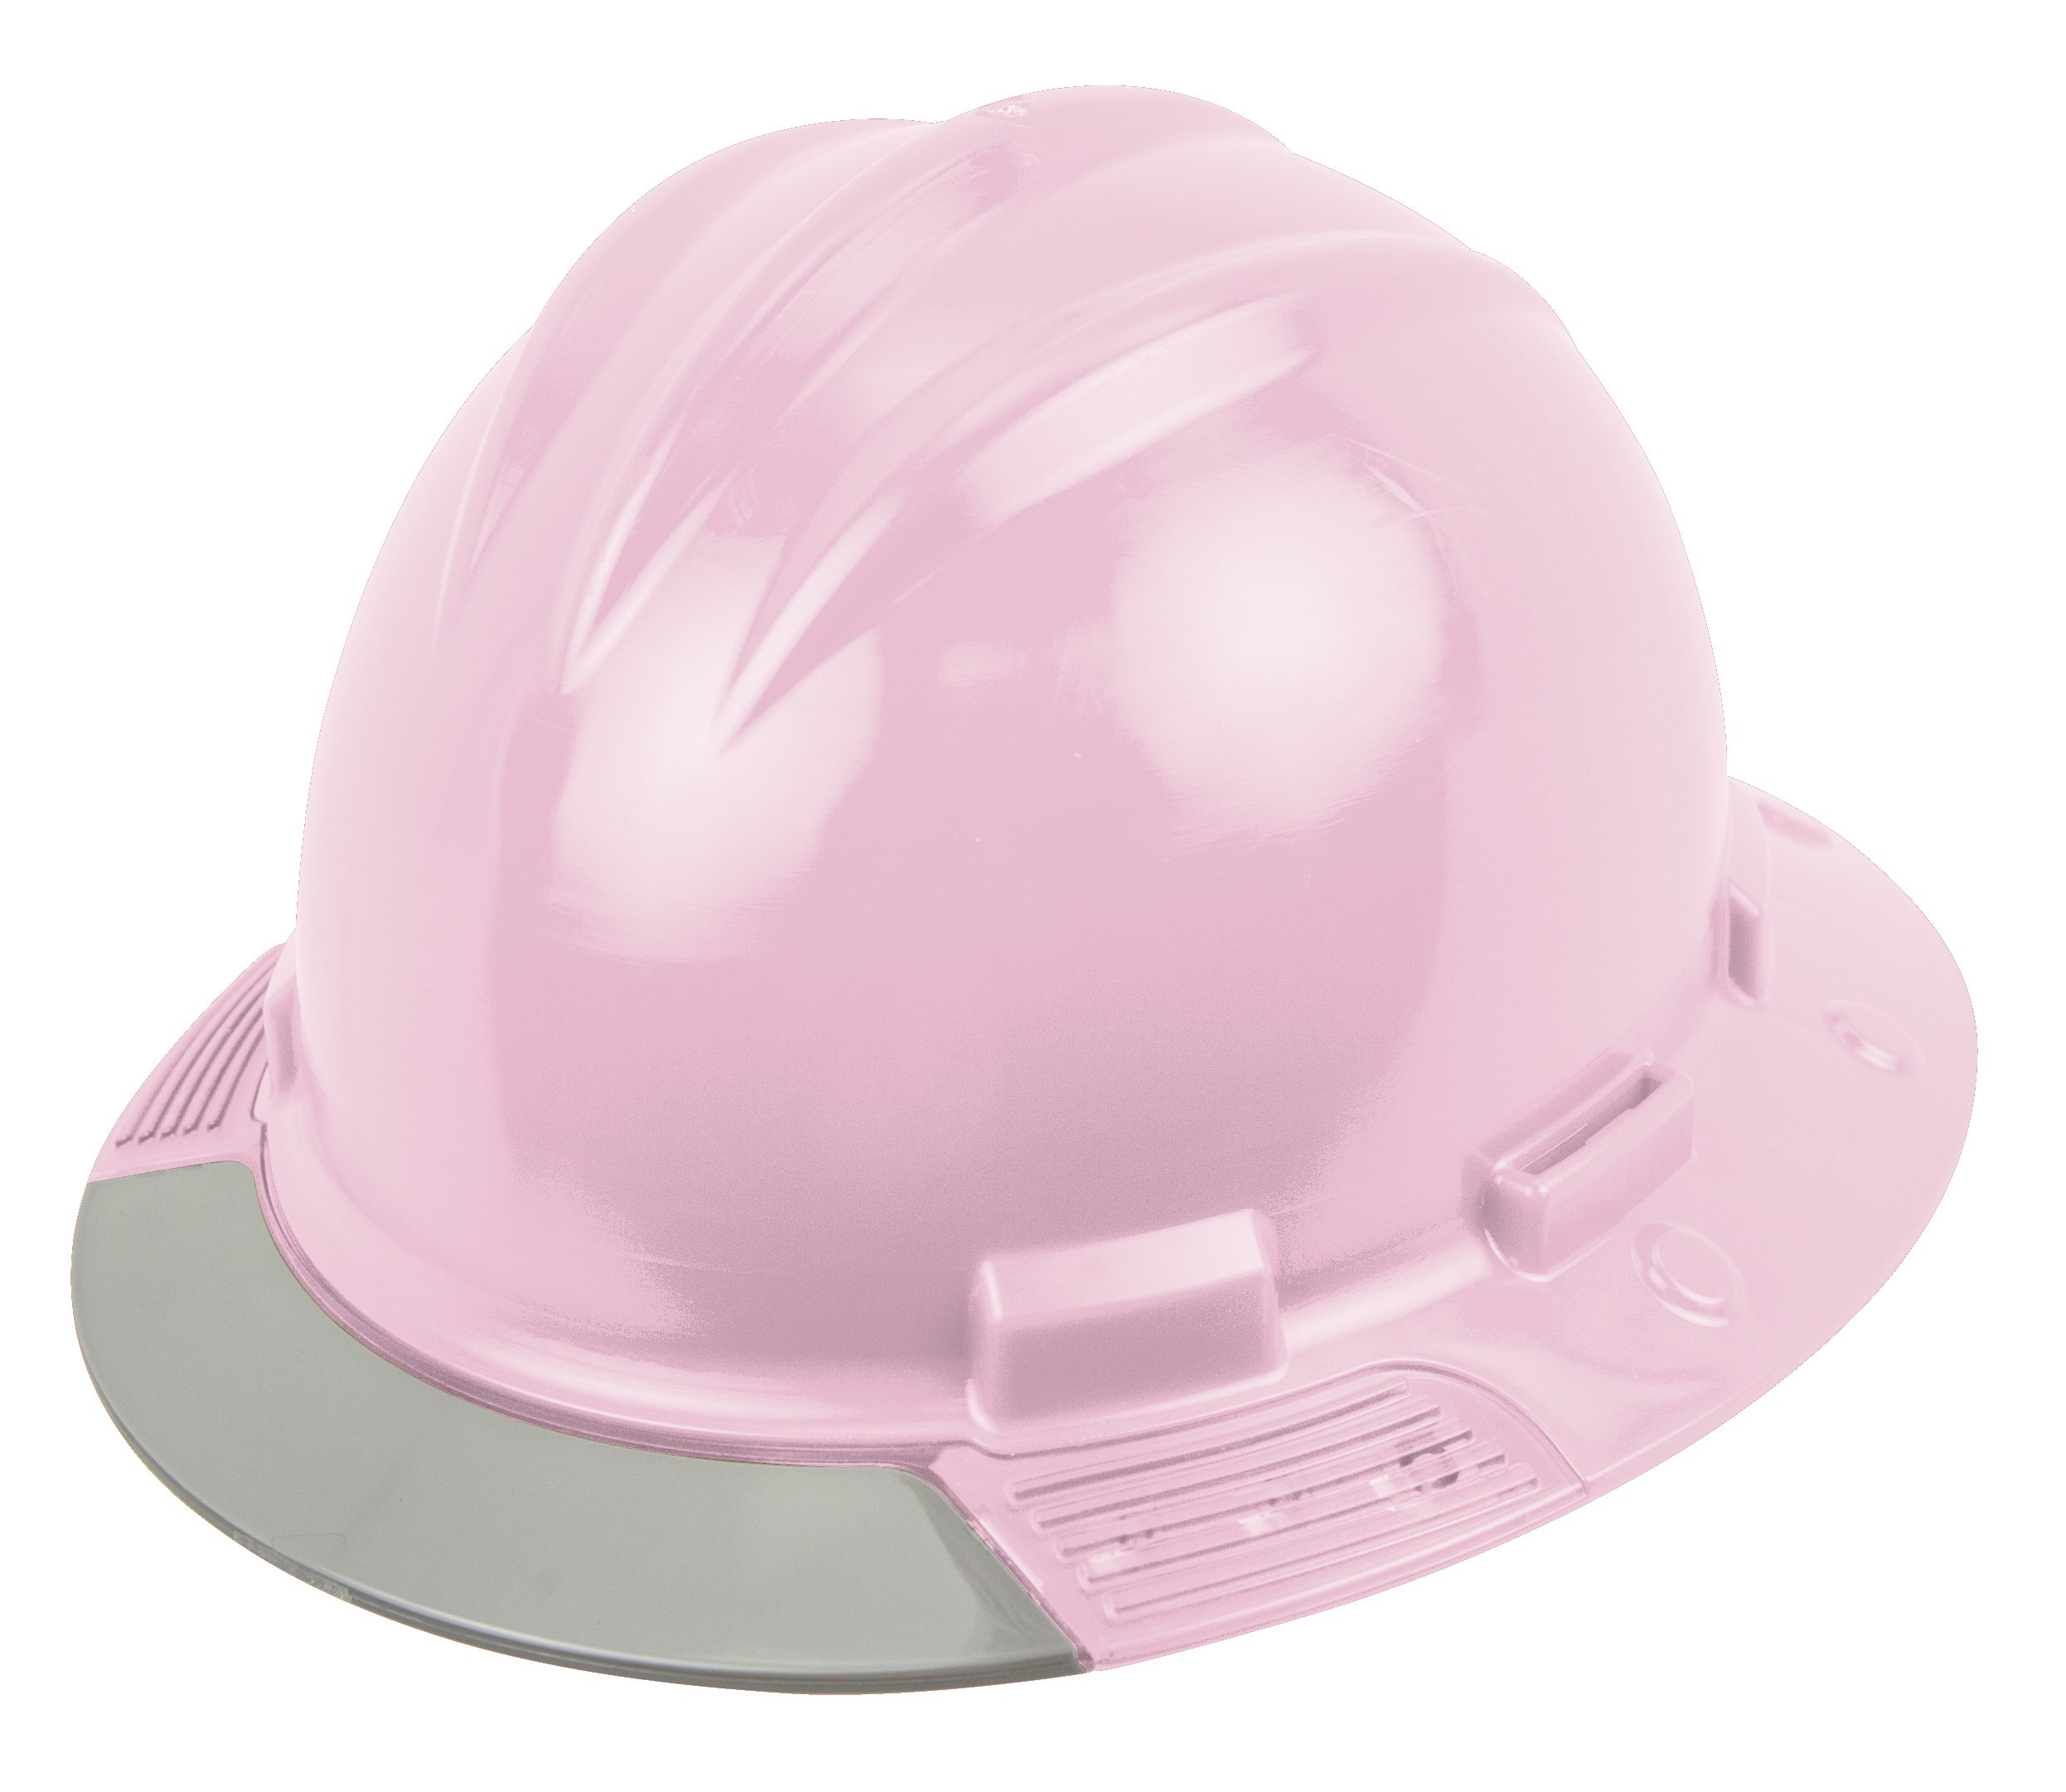 Bullard AVLPBG Above View Hard Hat, Light Pink, Vinyl Brow Pad, Ratchet Suspension, Grey Visor, One Size